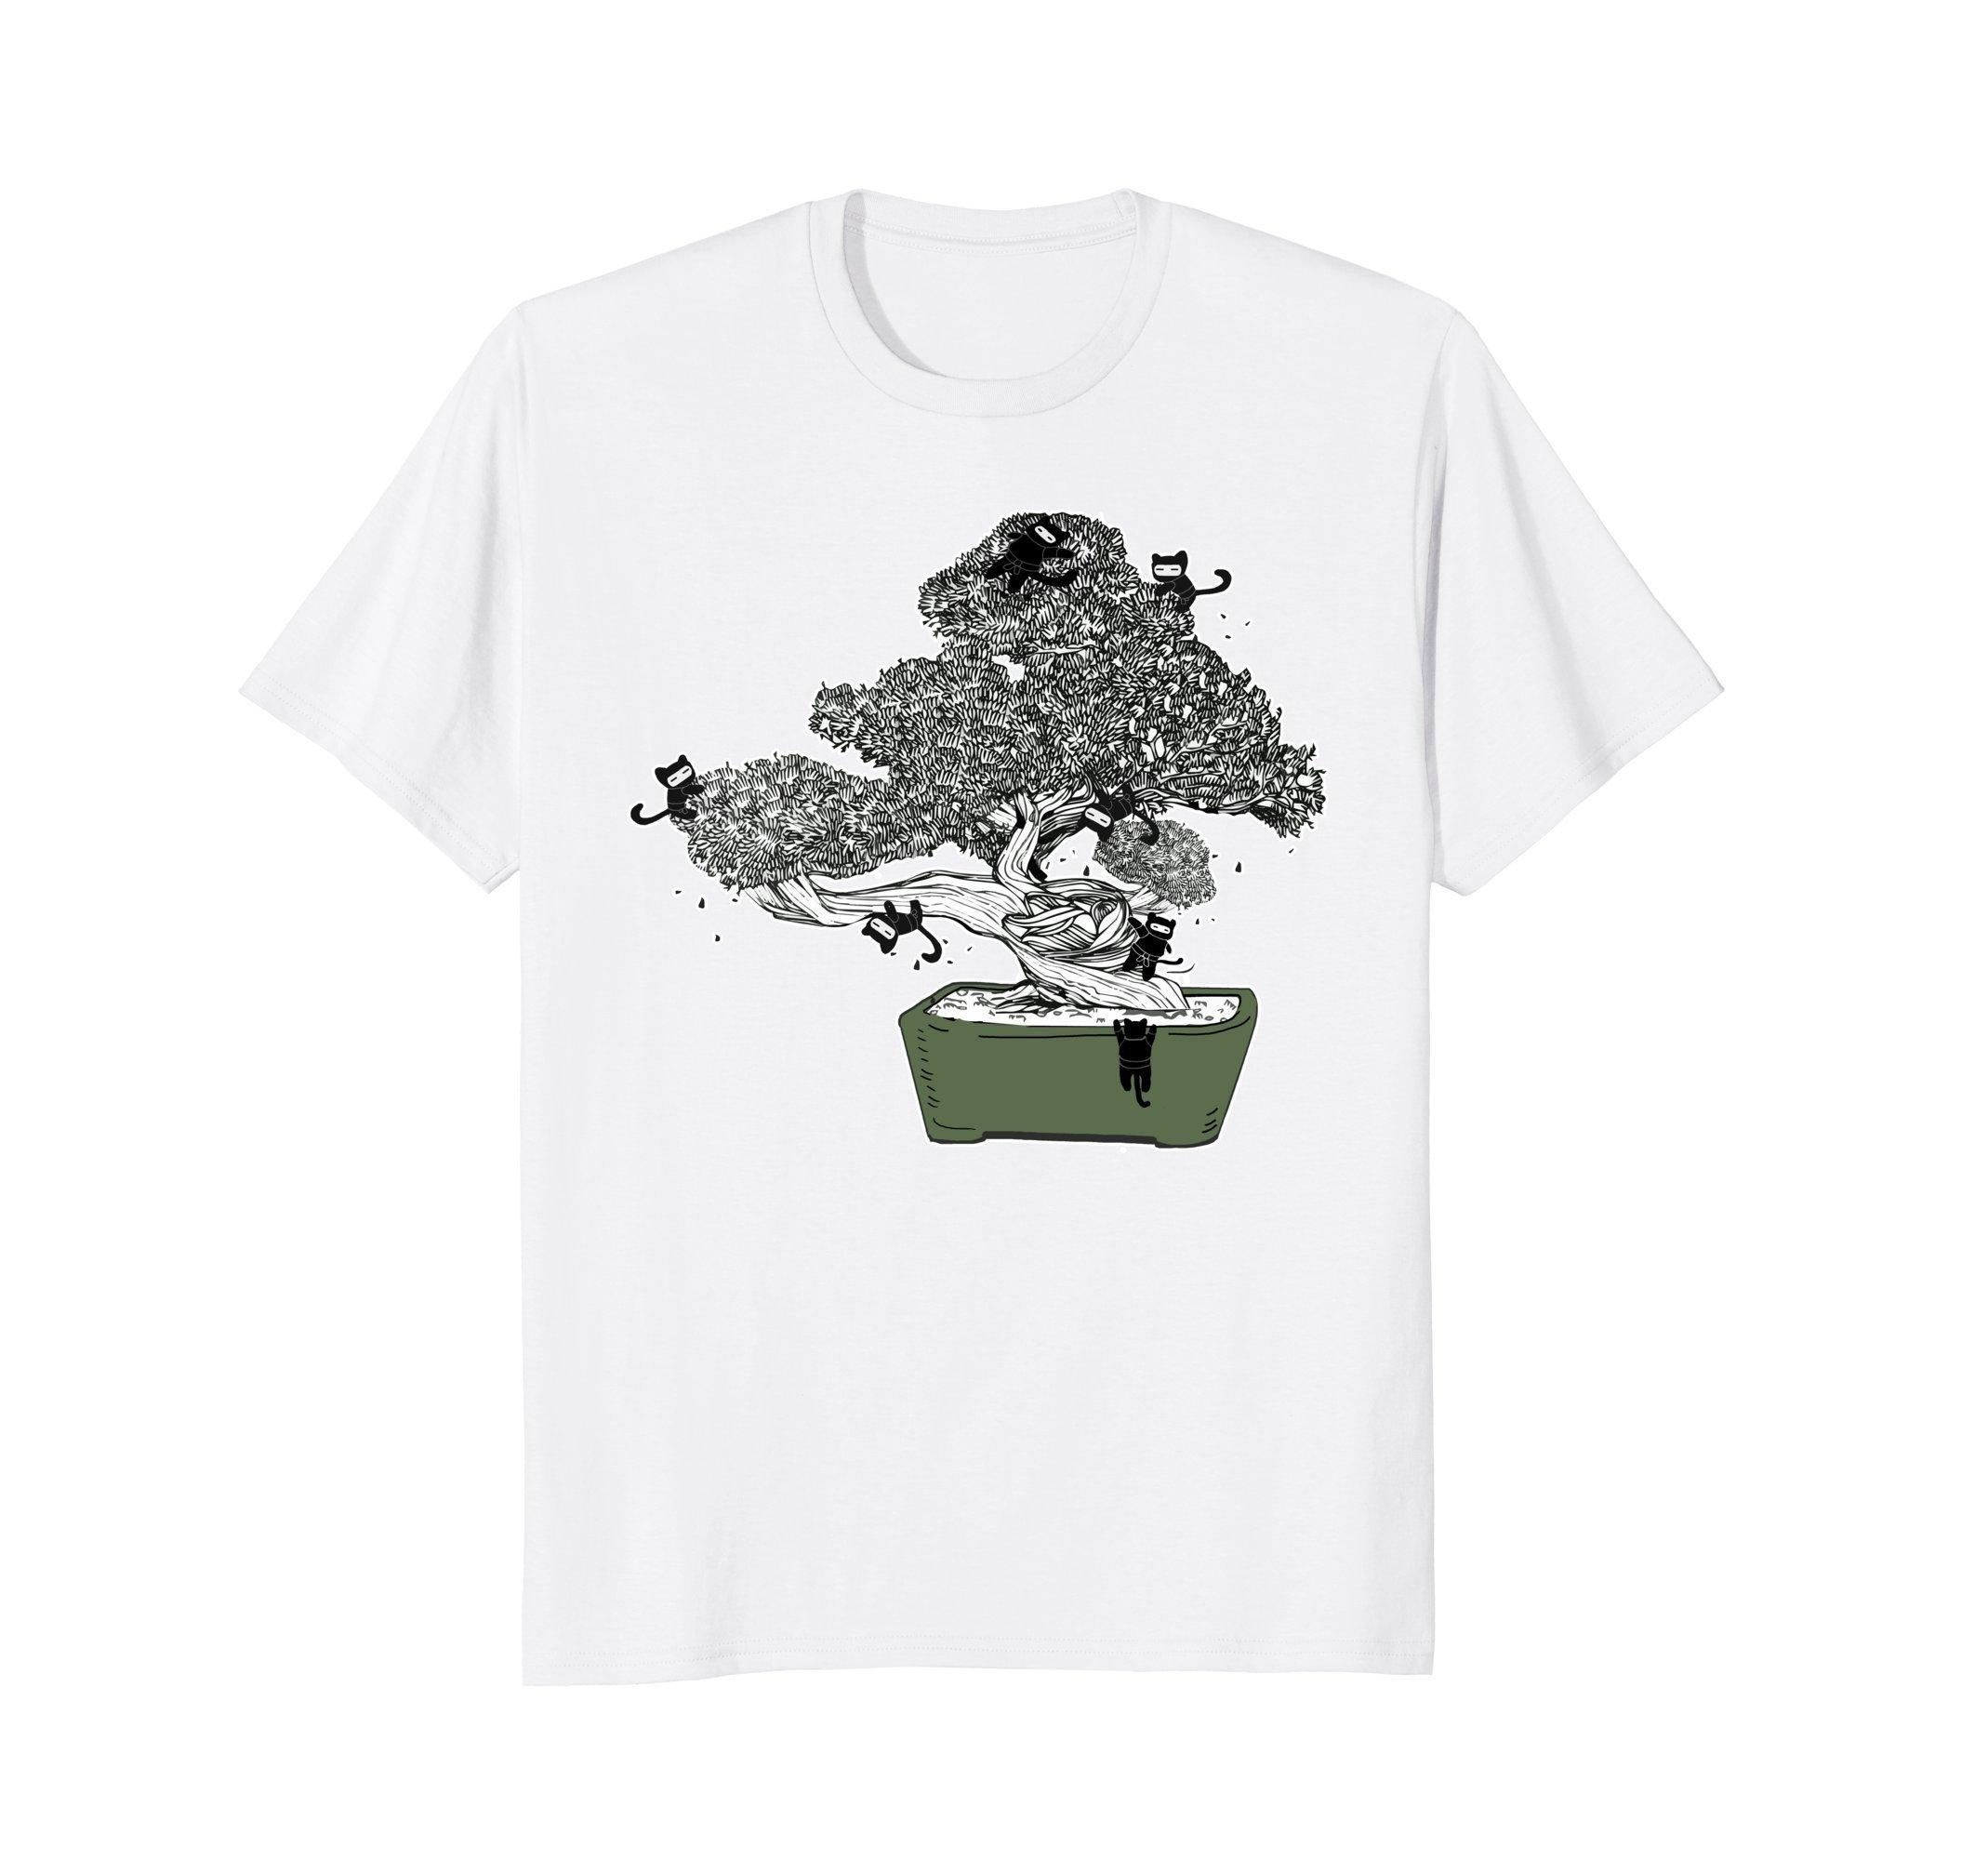 Ninja Kitty Cats Bonsai Tree Japanese Buddhist Zen Shirt by Zen Bonsai Tree Japanese Shirt by Crush Retro